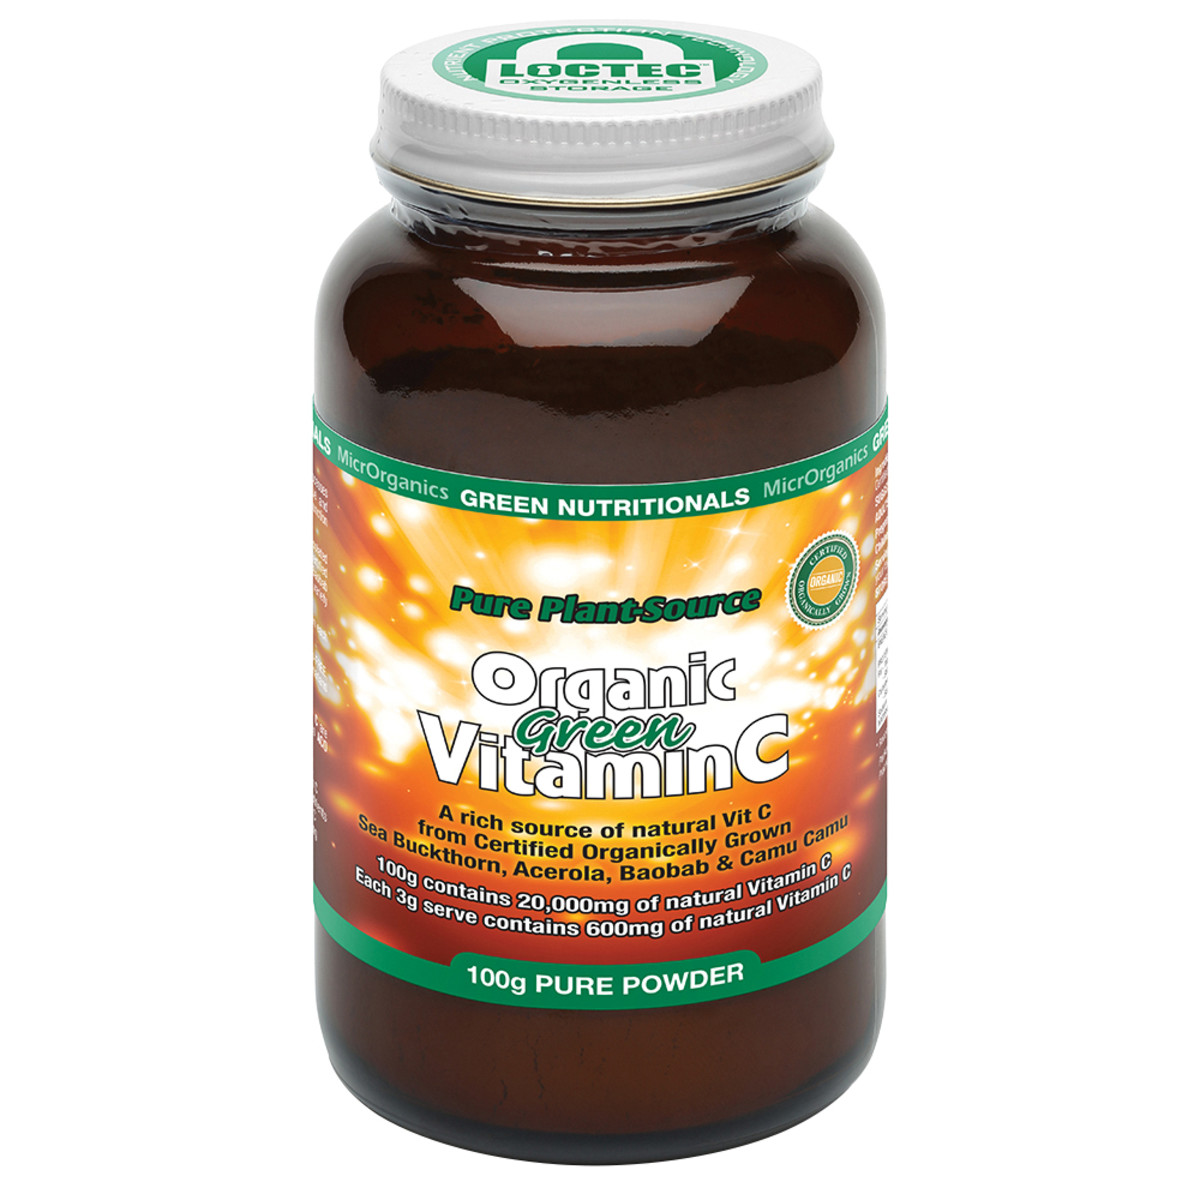 MICRORGANICS GREEN NUTRITIONALS GREEN VIT C POWDER 100G